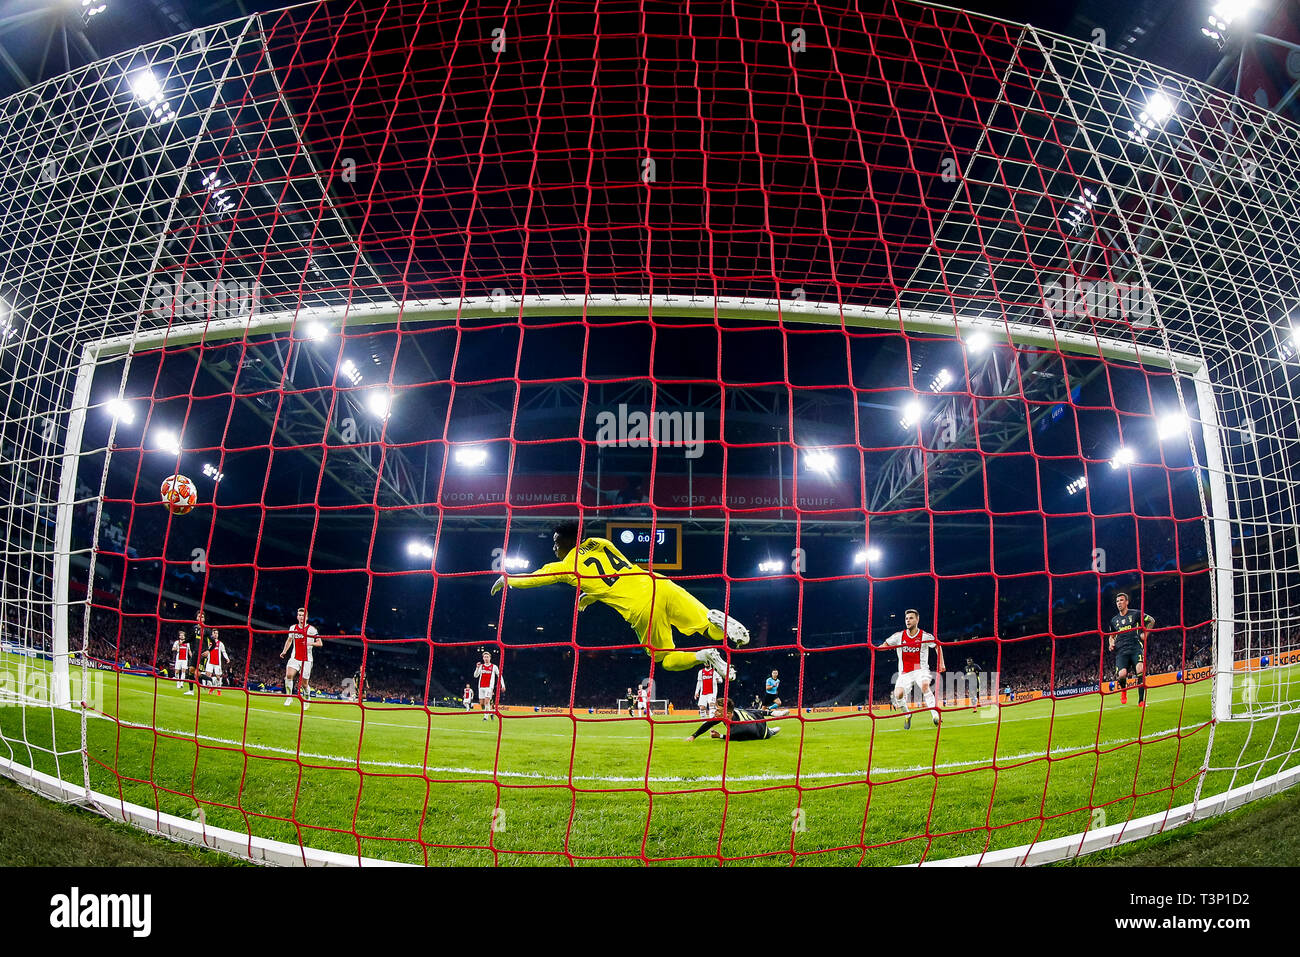 AMSTERDAM, Football,10-04-2019, Stadium Johan Cruyff Arena. Champions League quarter finals first leg Ajax - Juventus, Juventus player Cristiano Ronaldo (M) scores 0-1, Ajax goalkeeper Andre Onana (5L) - Stock Image